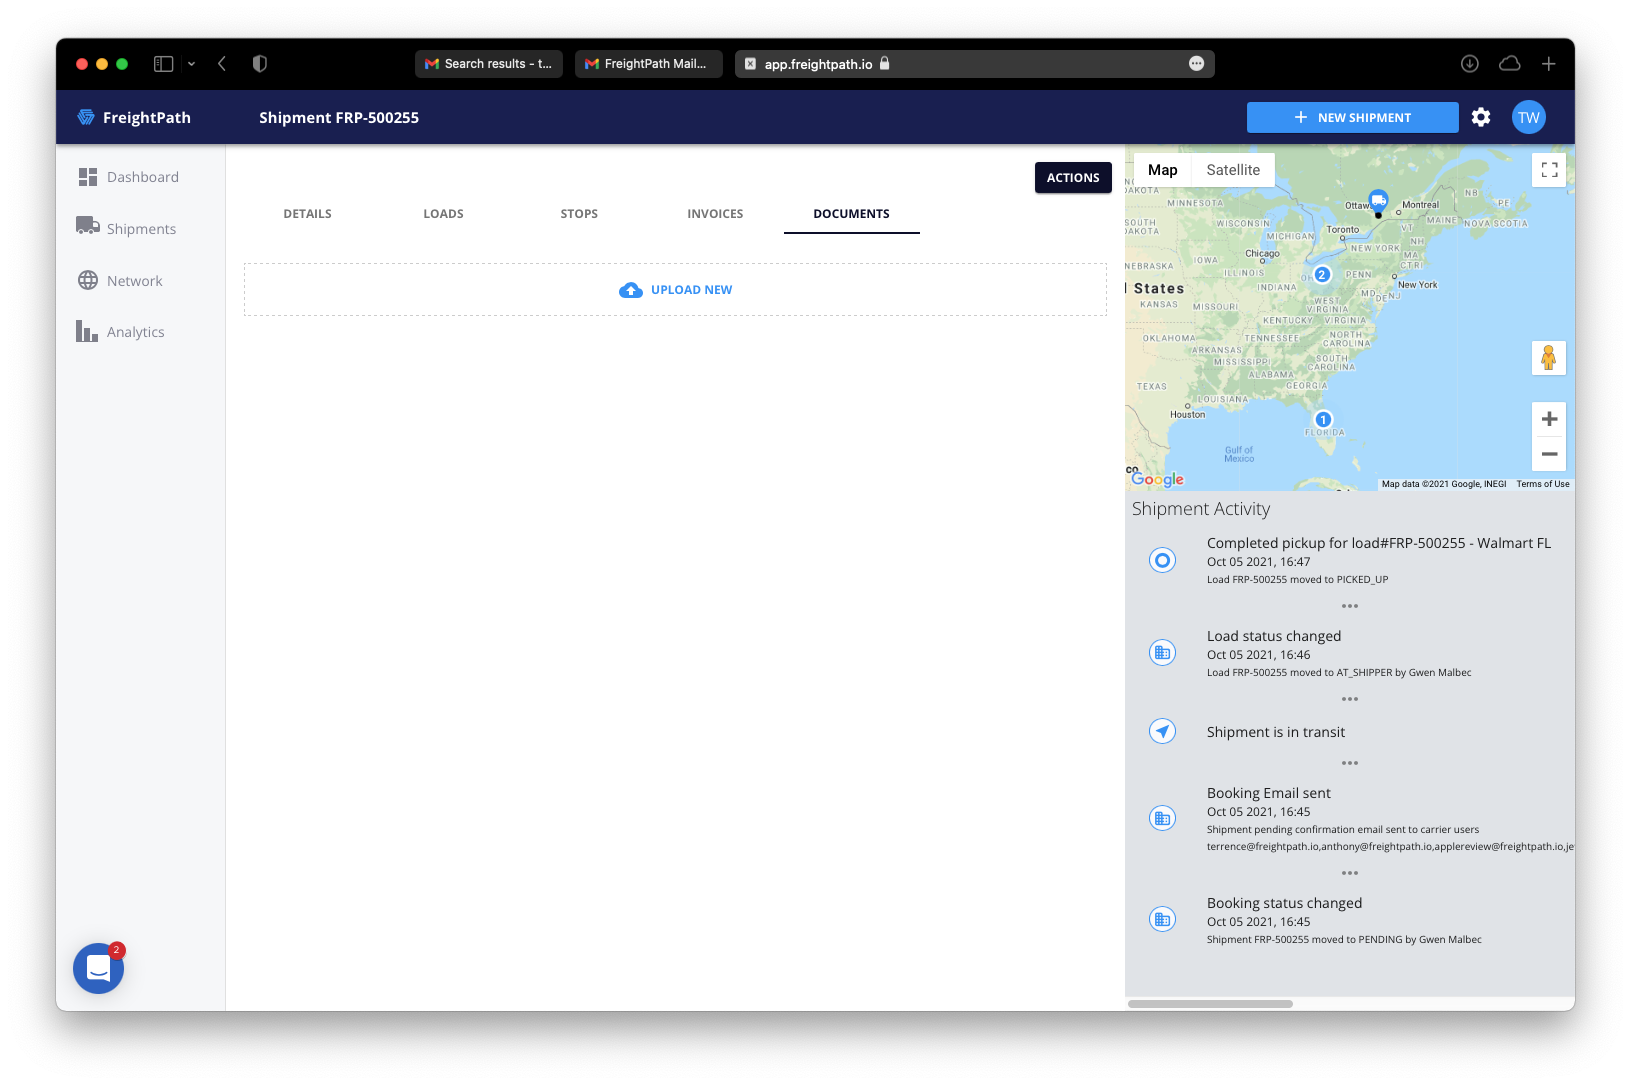 freightpath email upload shared documents screenshot